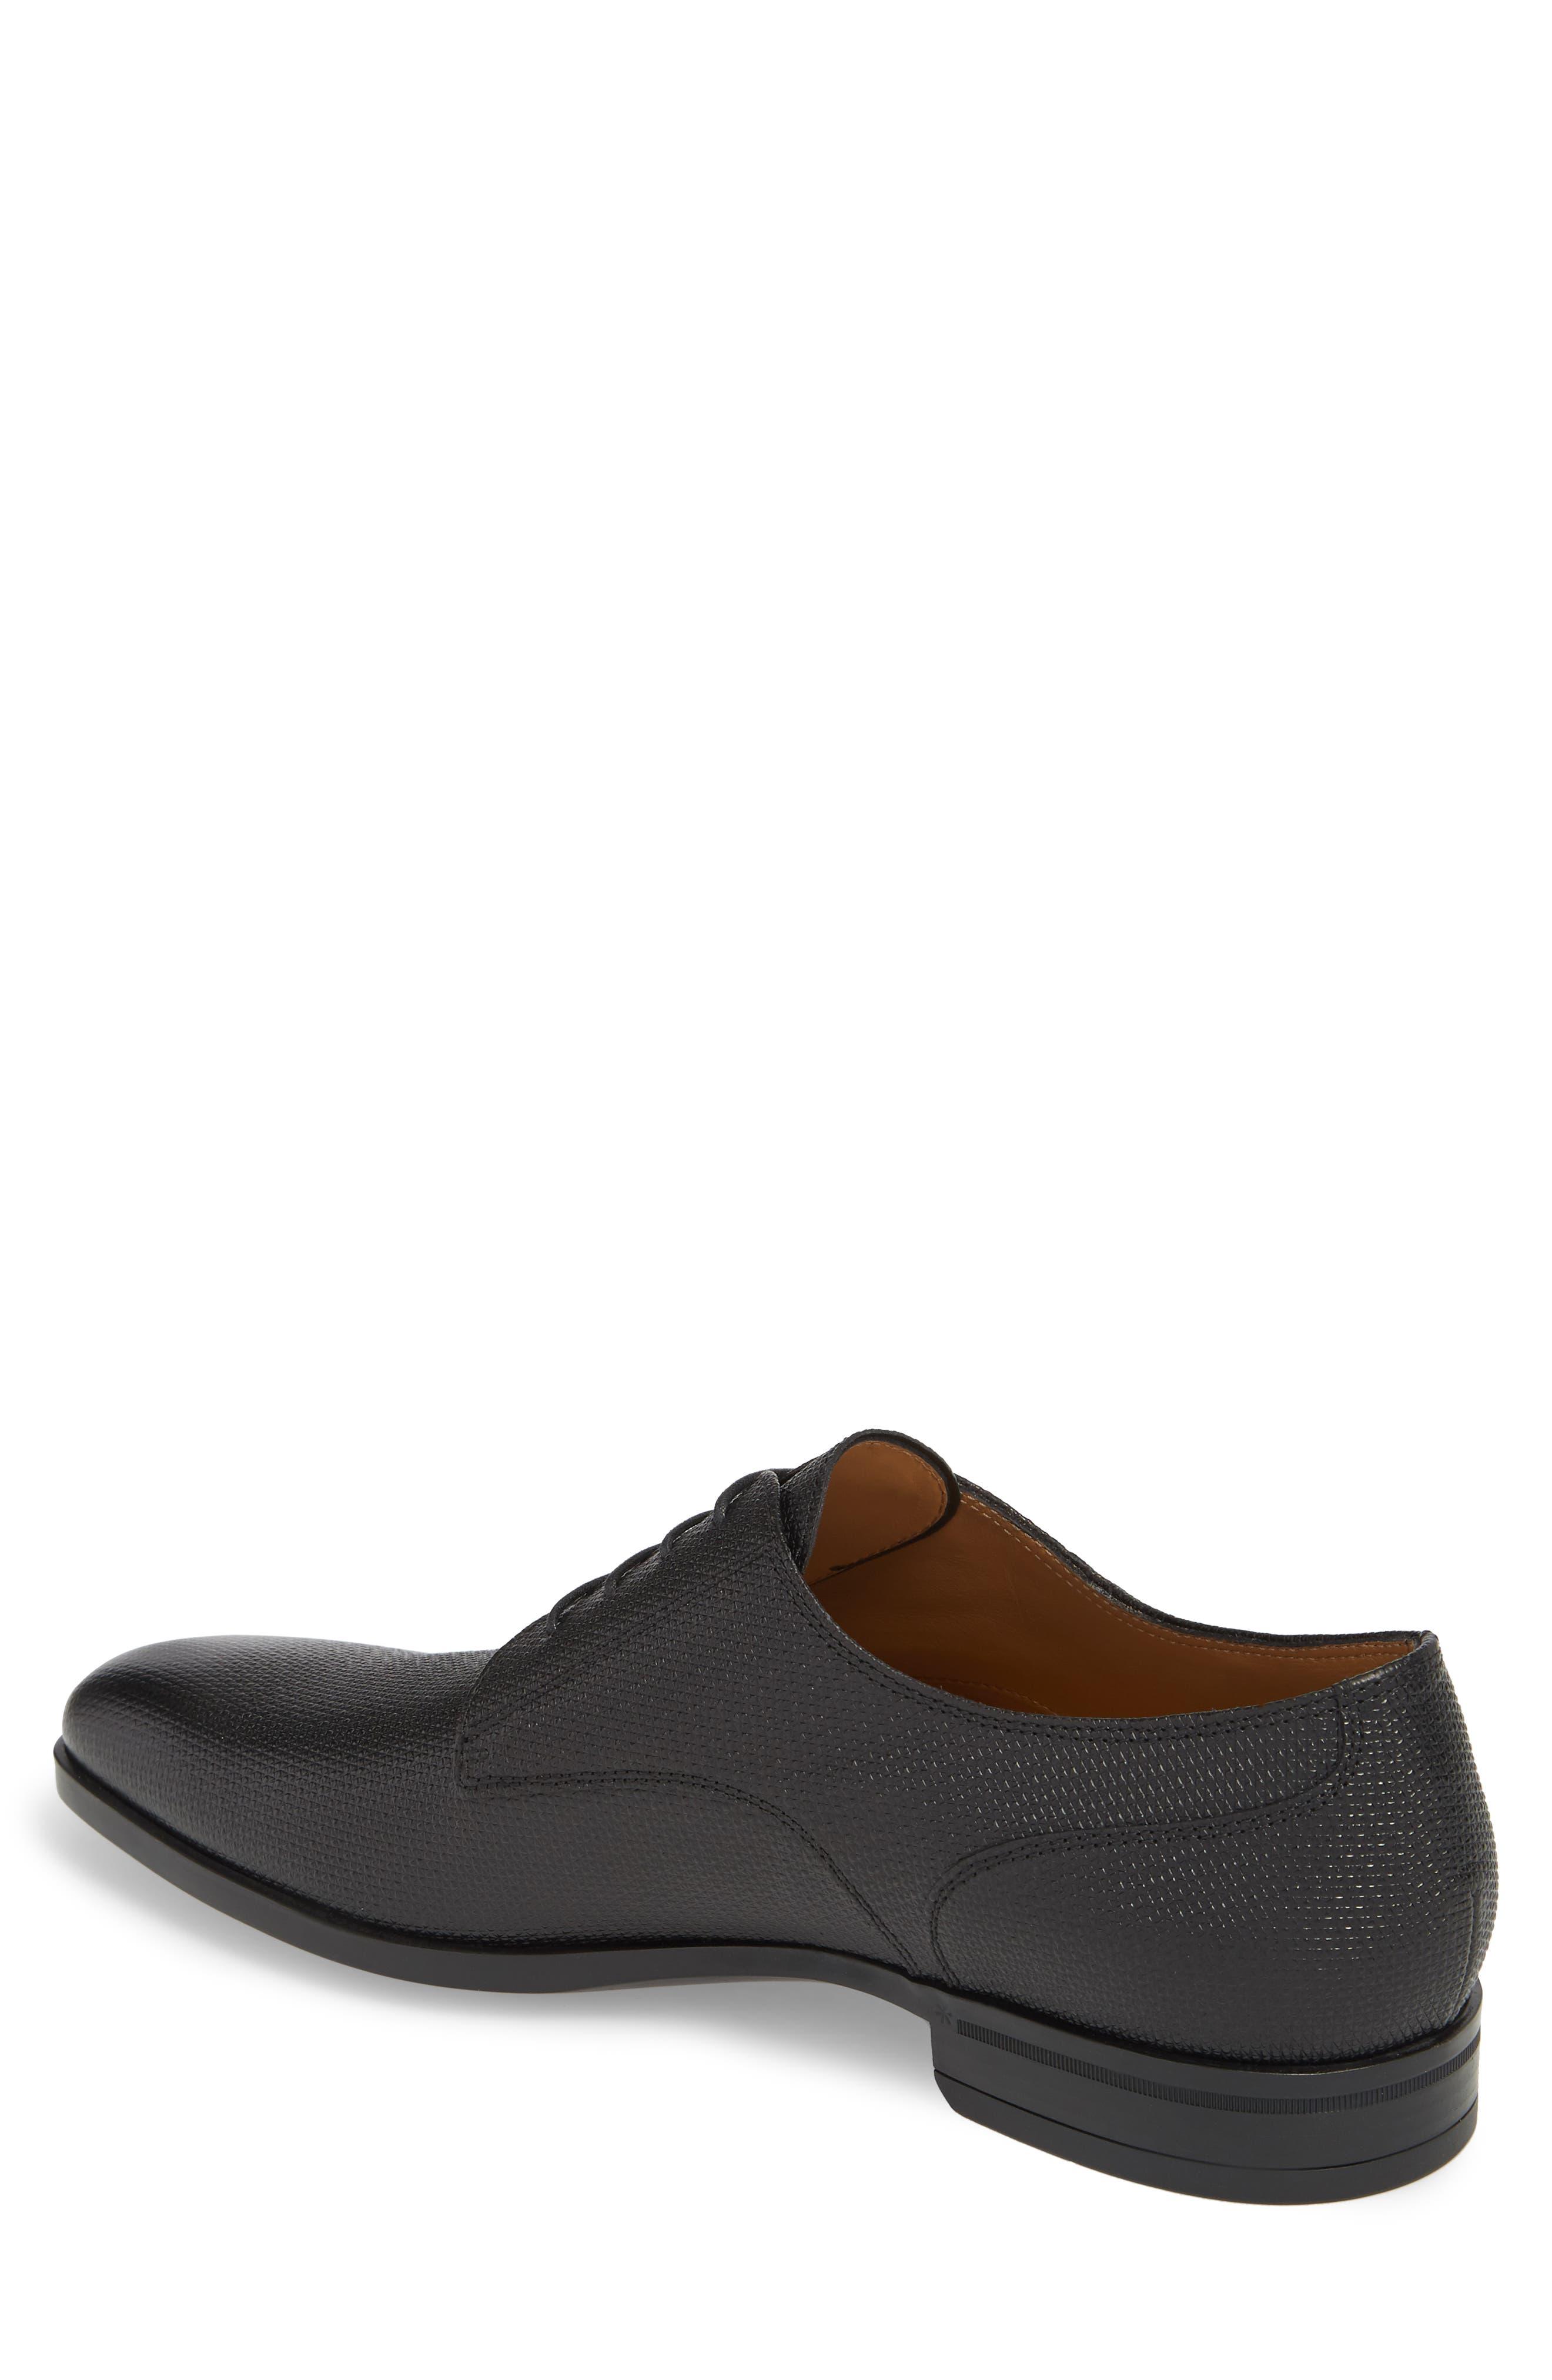 Hugo Boss Portland Embossed Plain Toe Derby,                             Alternate thumbnail 2, color,                             BLACK LEATHER